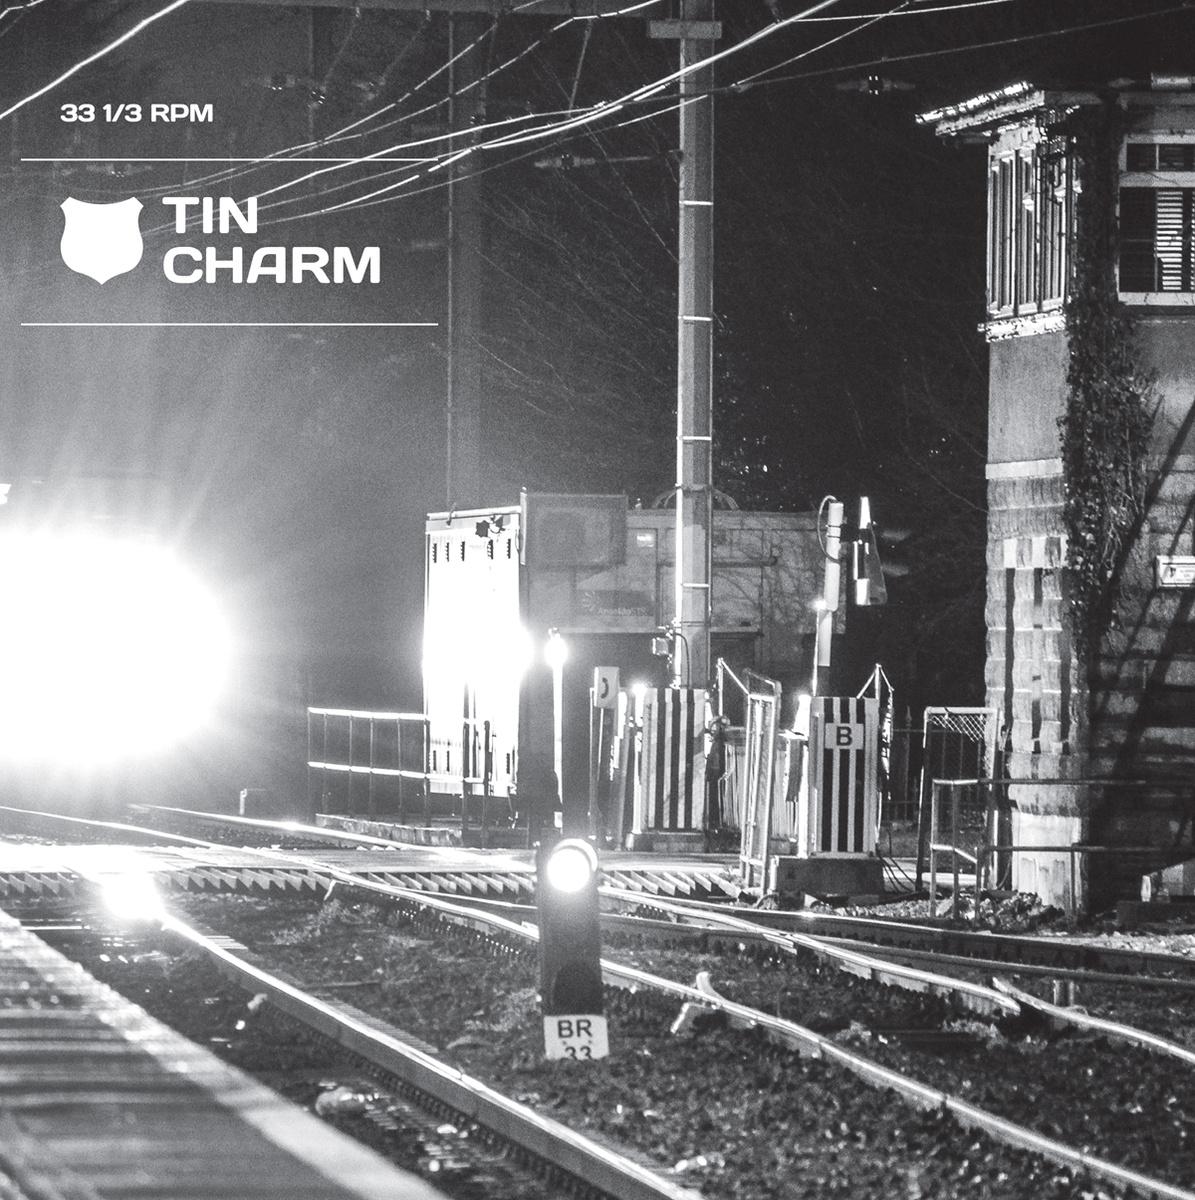 Tin Charm - The Engine is Bleeding